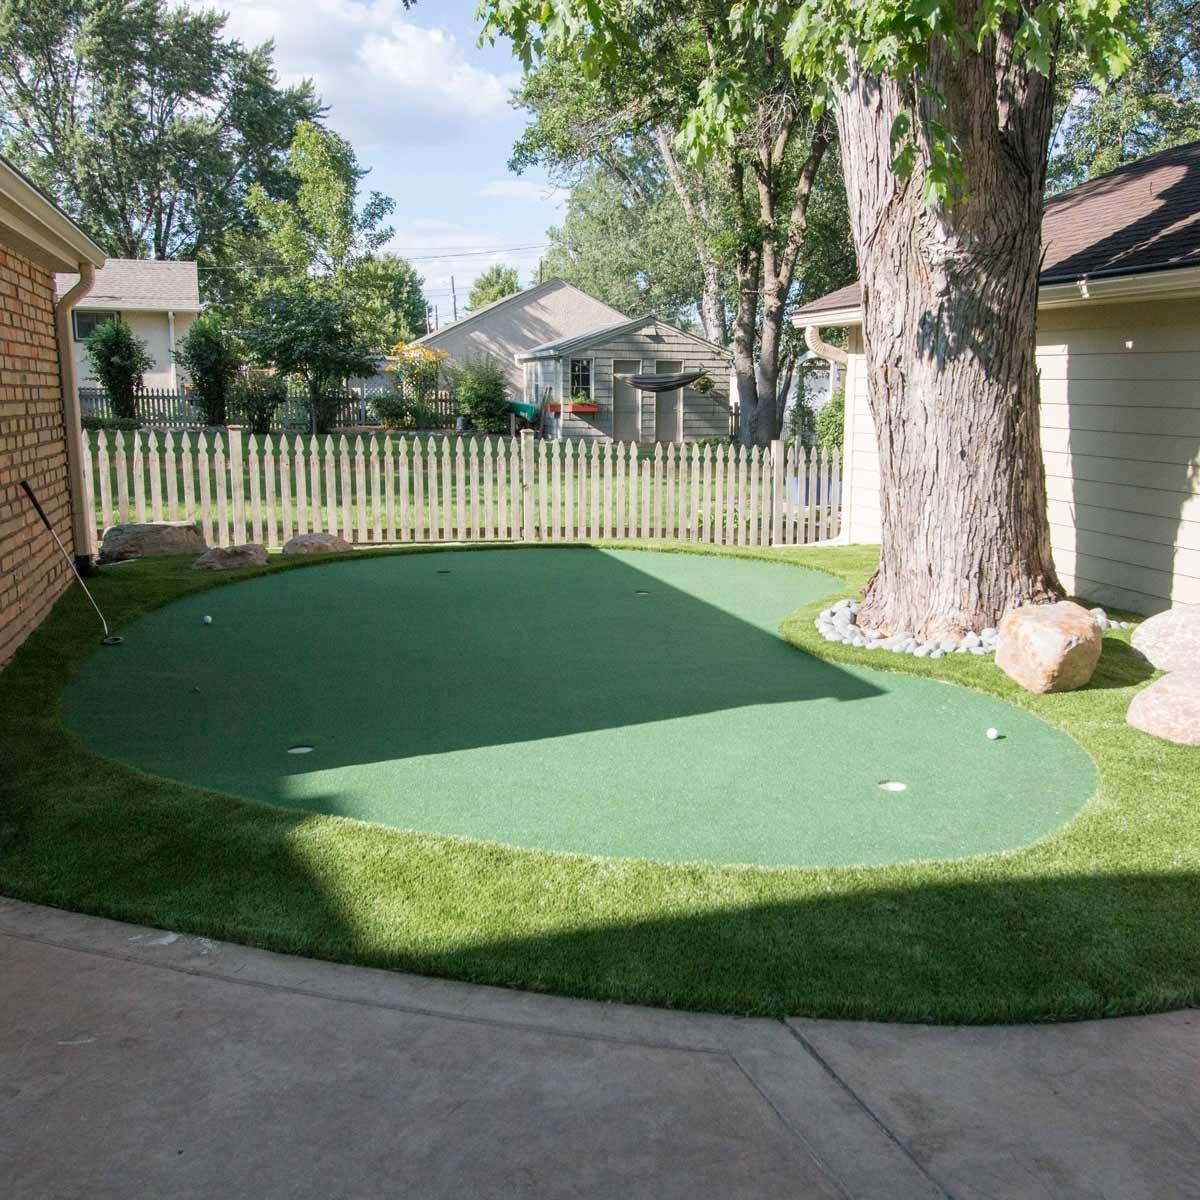 19 Crazy Cool Backyard Putting Greens Family Handyman